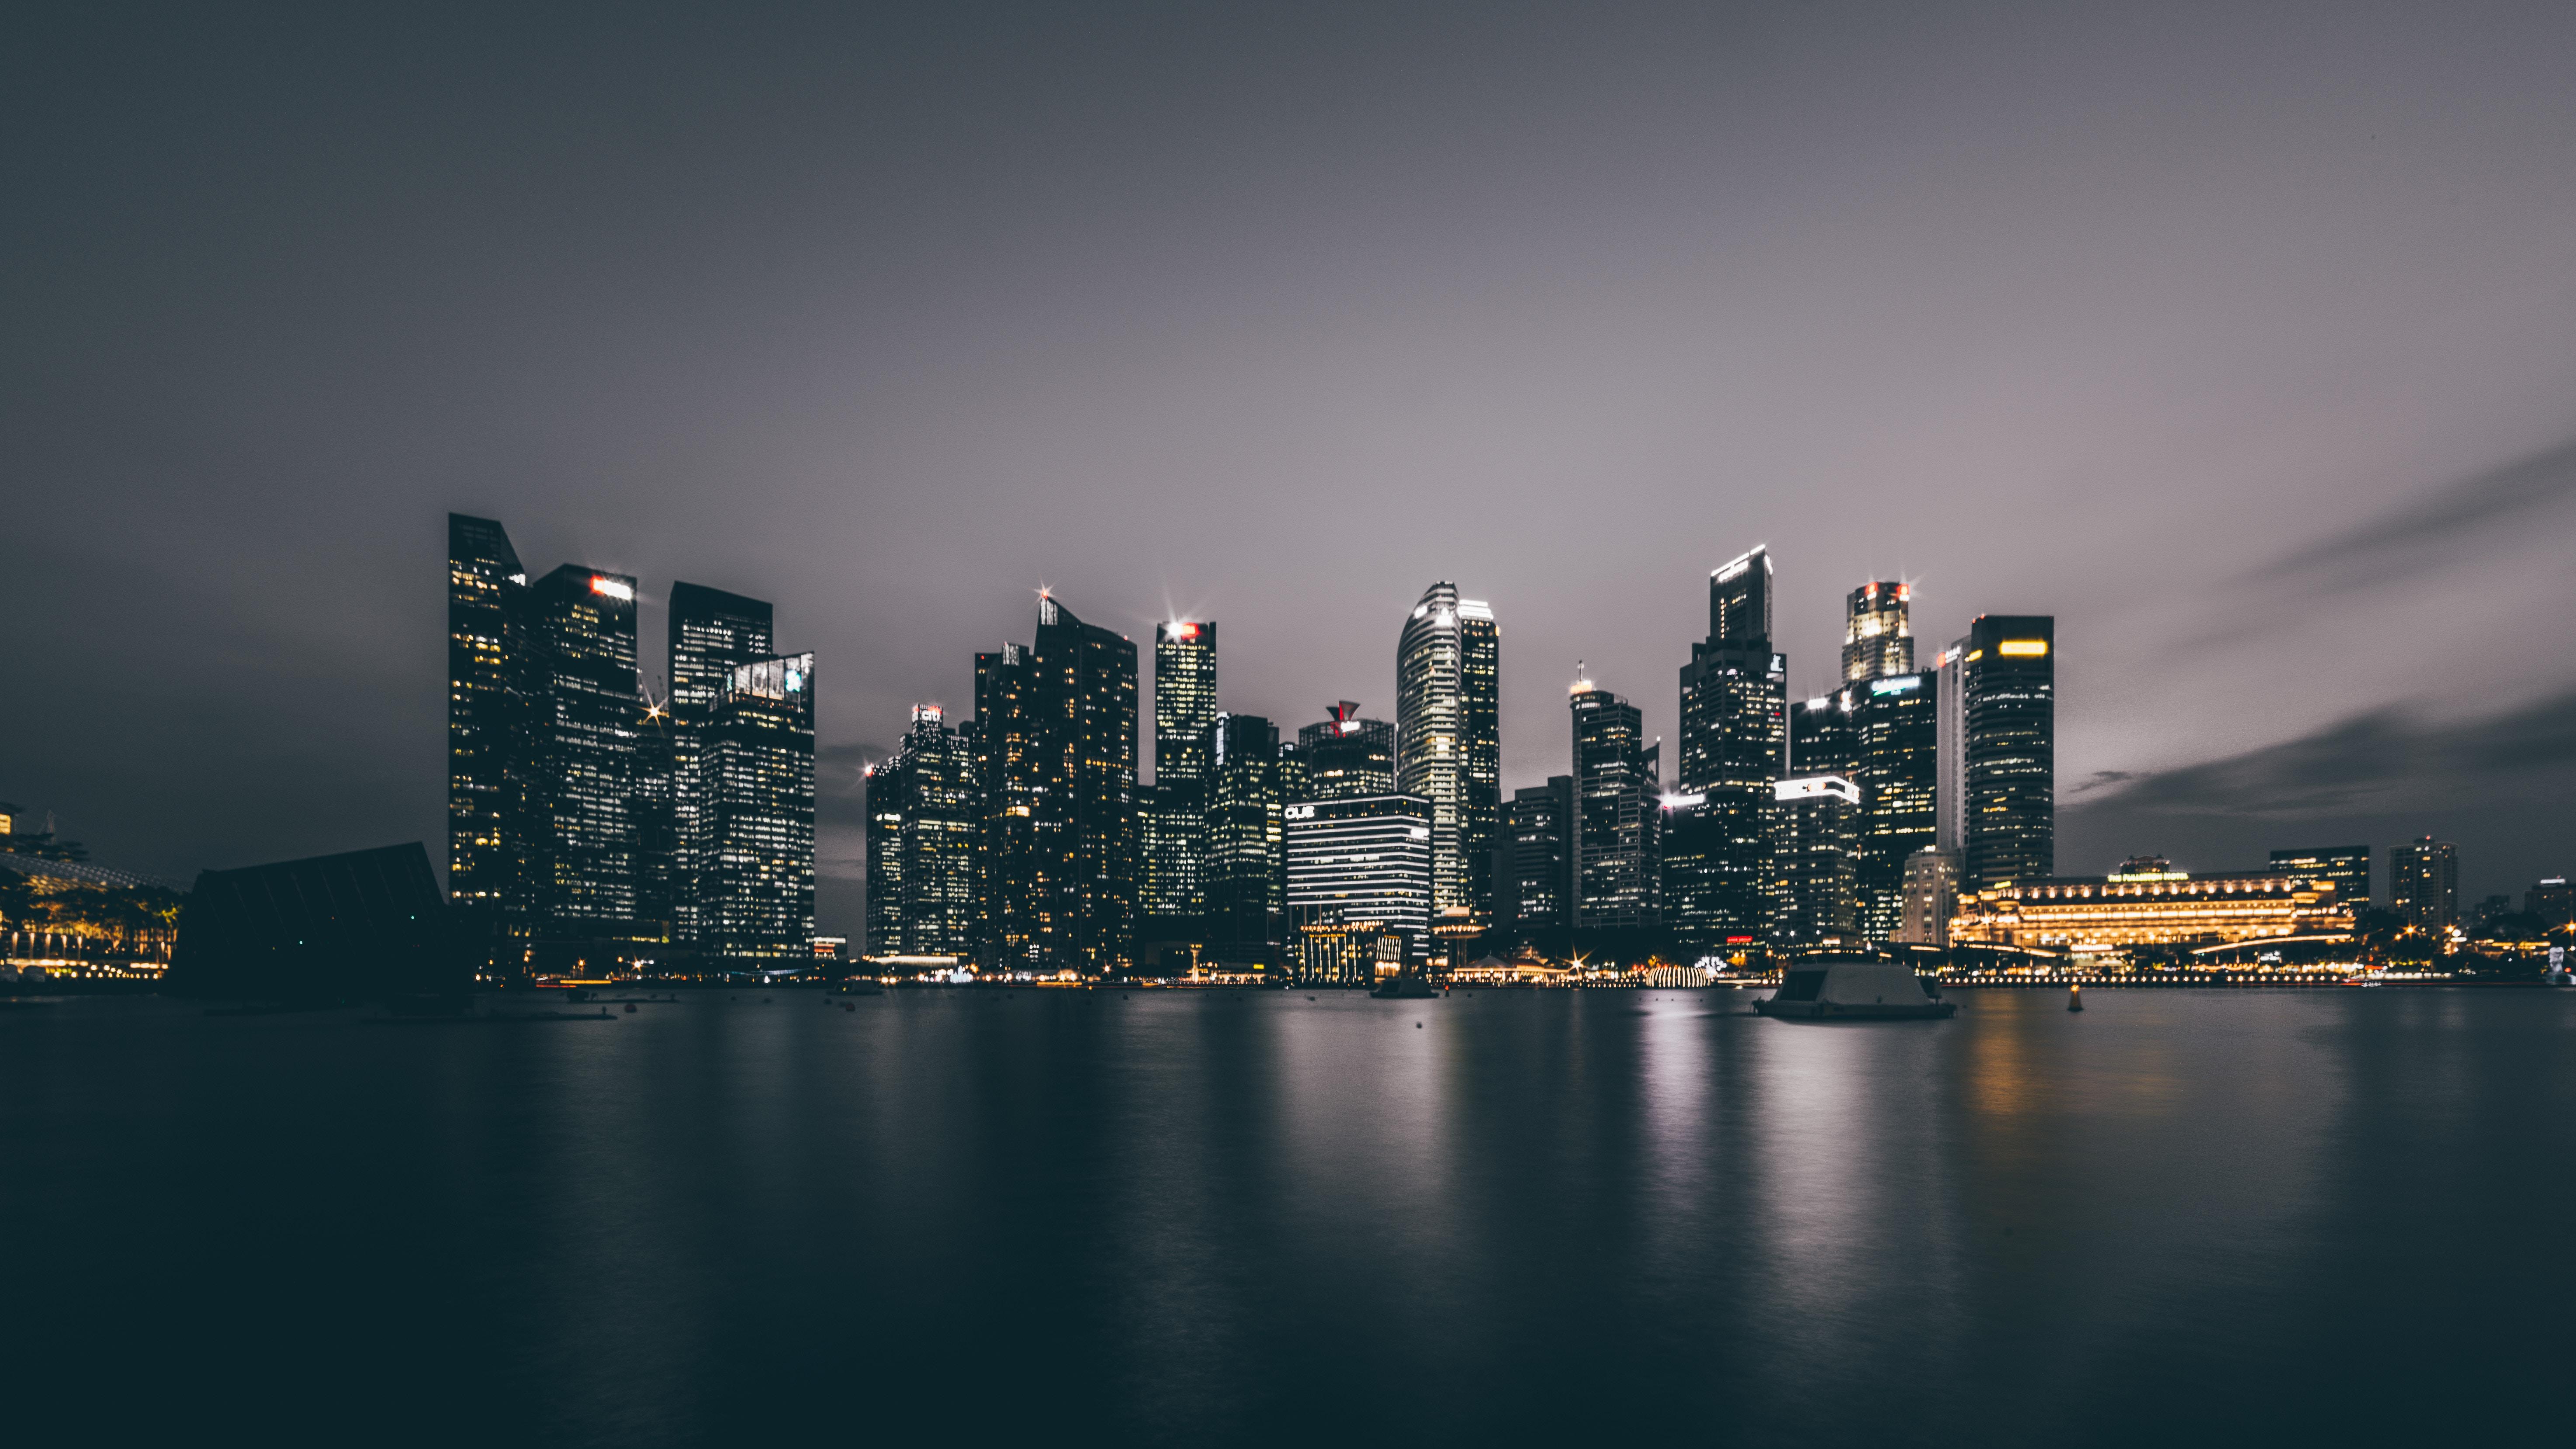 Landing jobs in Singapore in 2018 inside its beautiful city